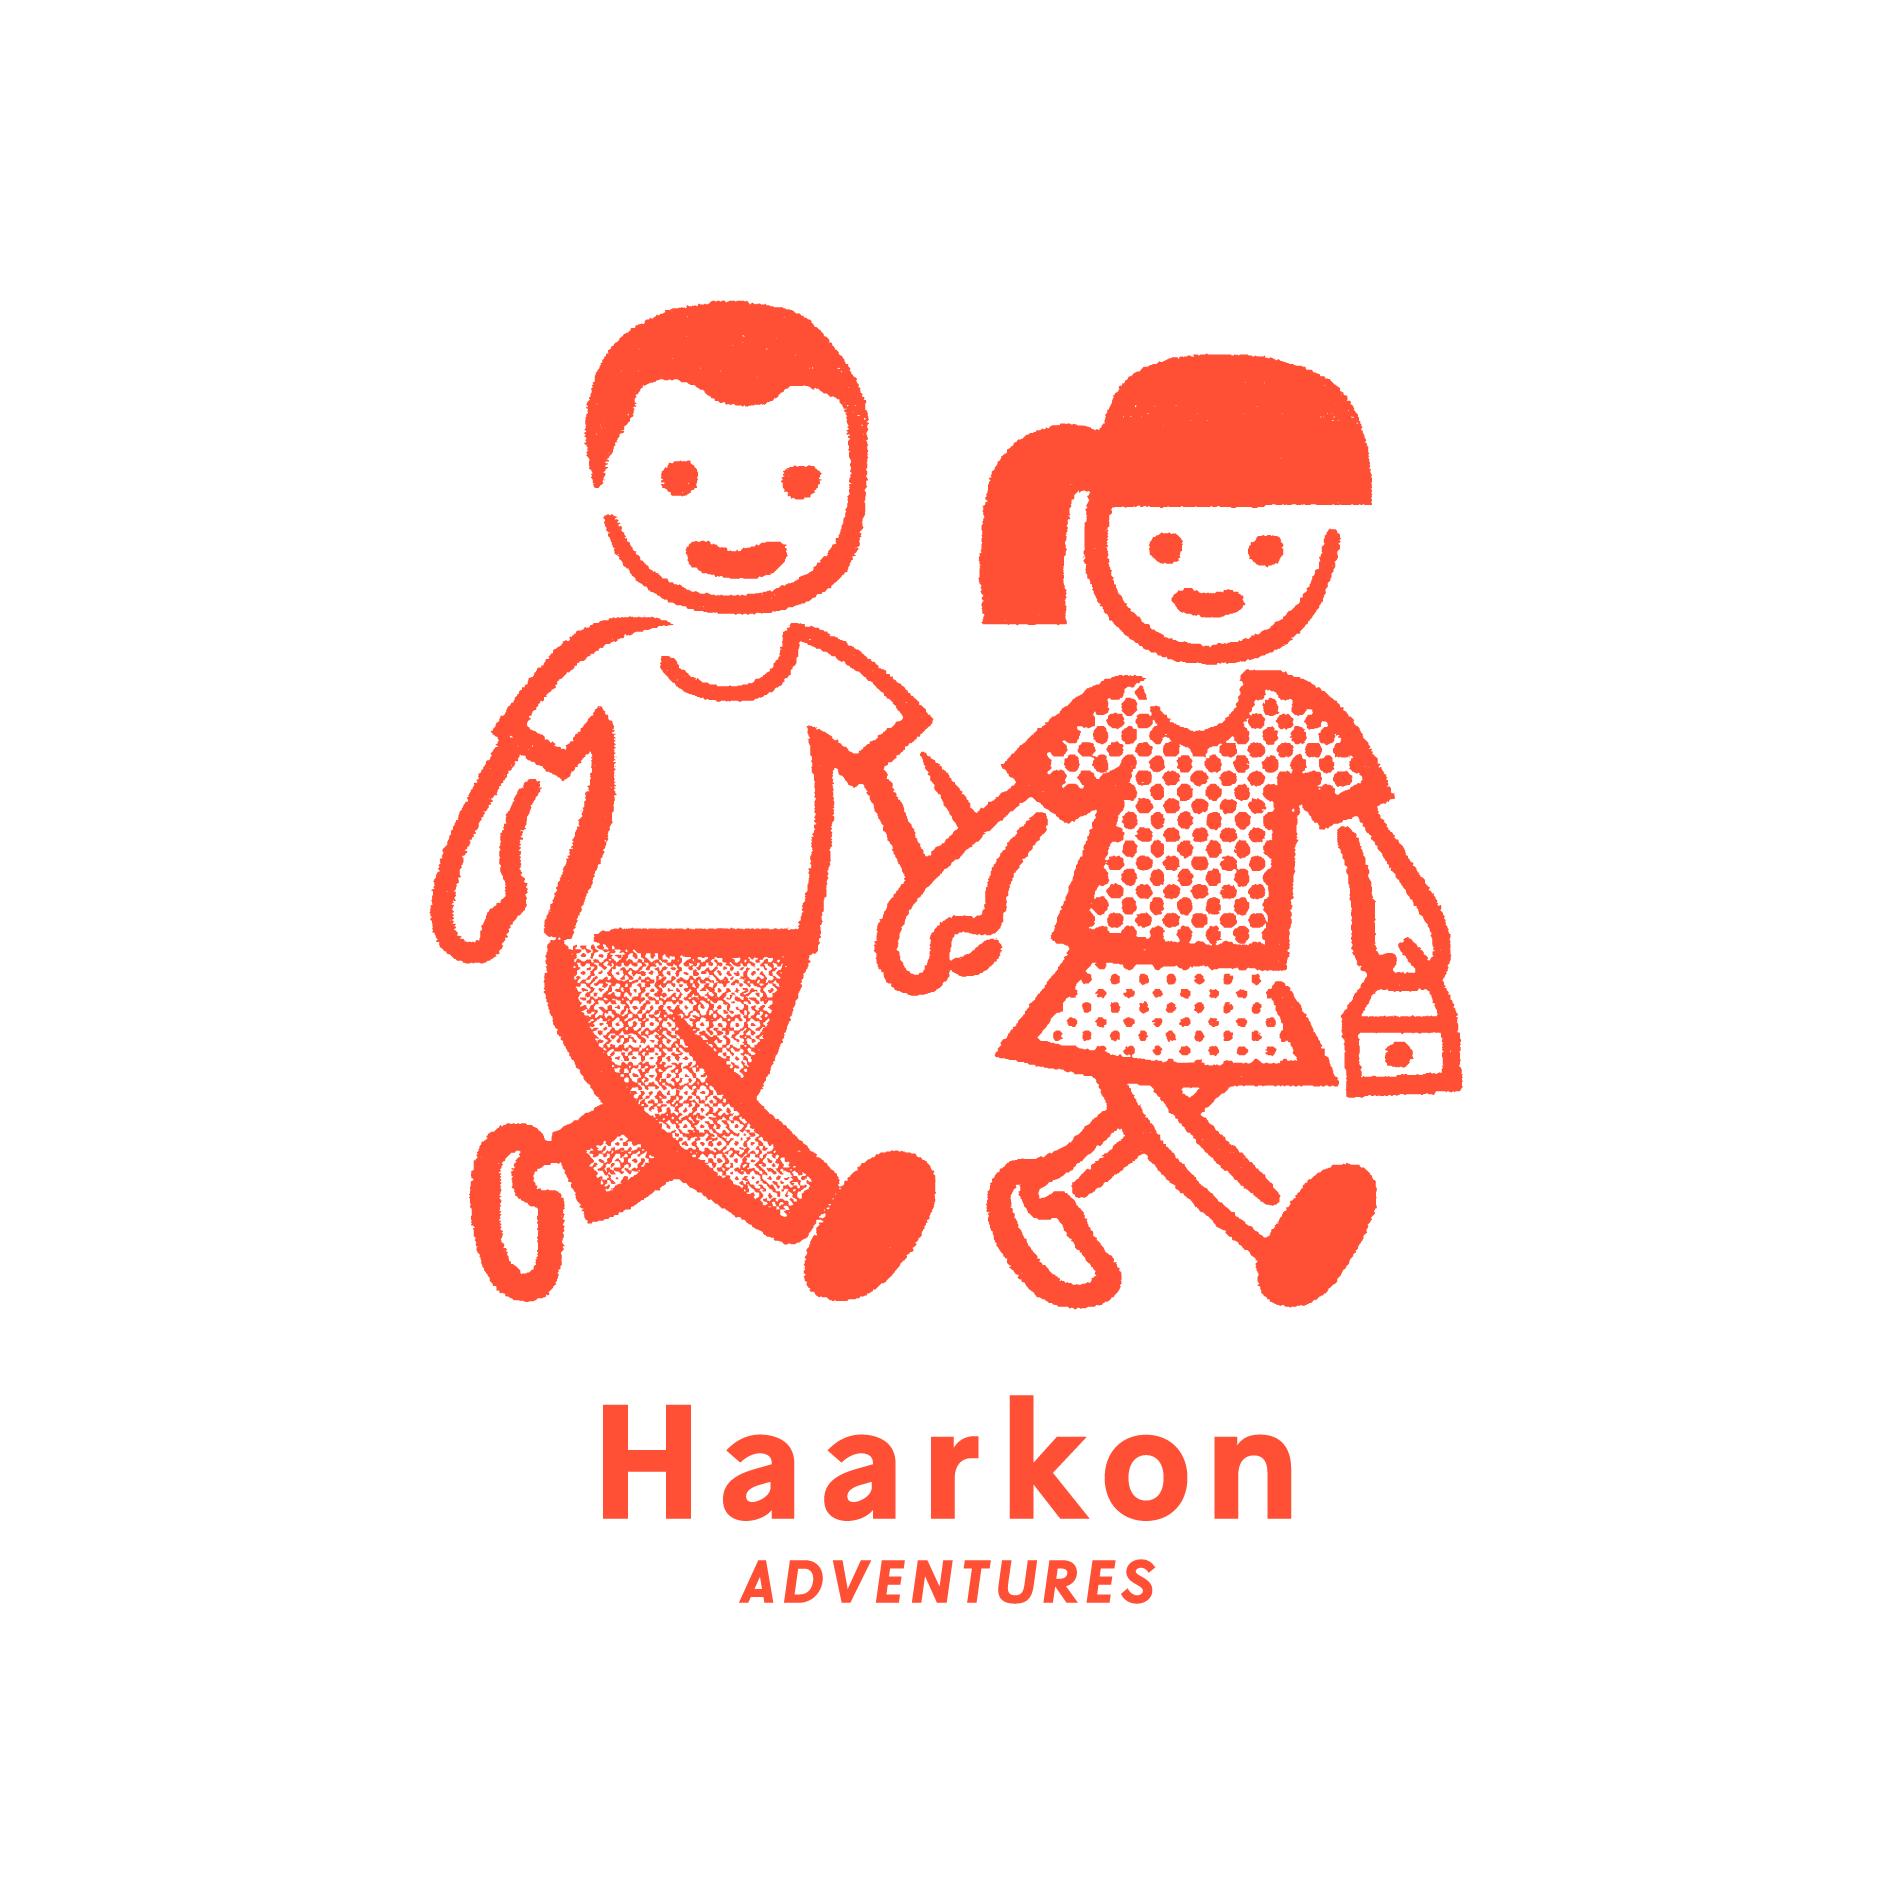 Haarkon characters sticker